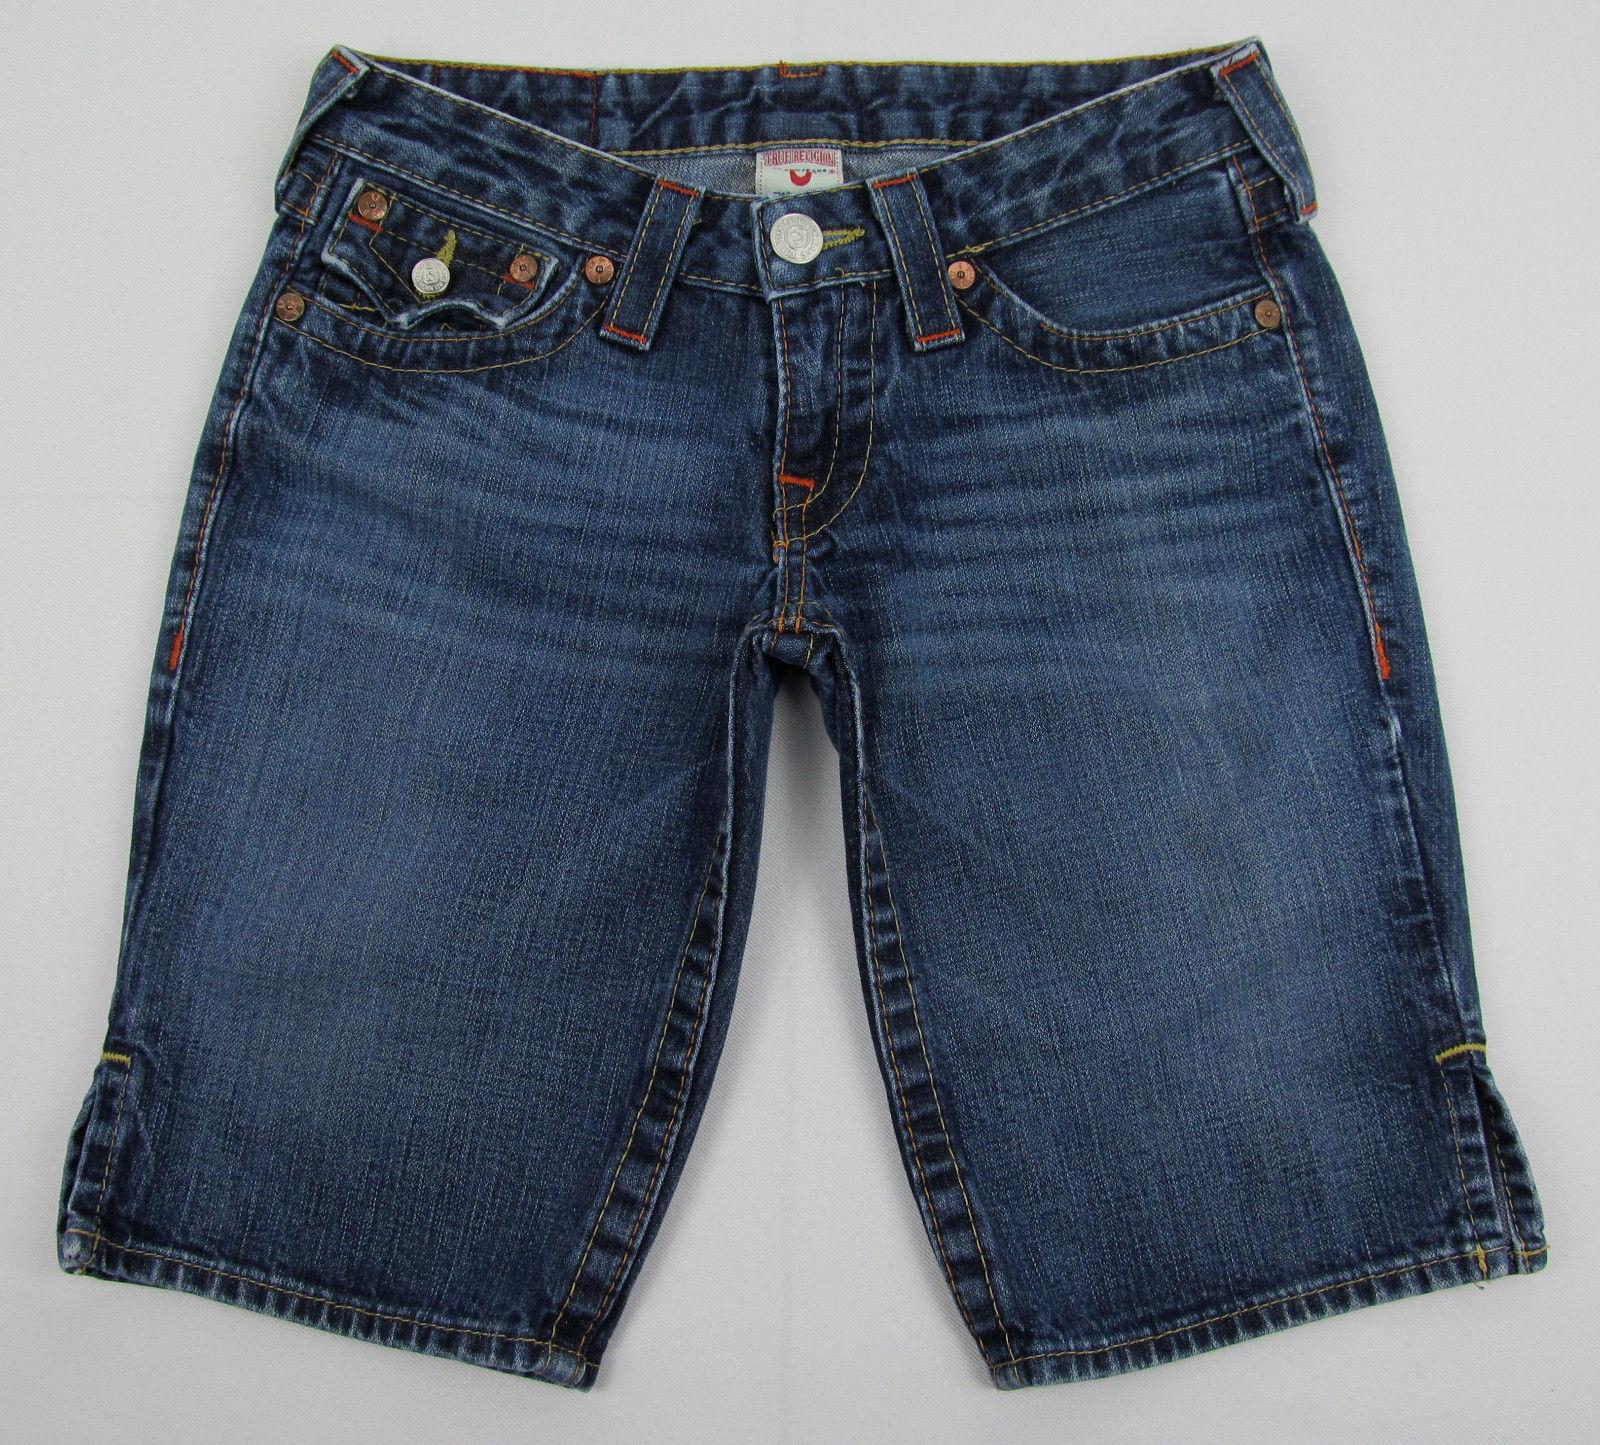 True Religion Joey jean shorts Jorts Flap Back USA Made Blue Womens Size 26 - $24.70